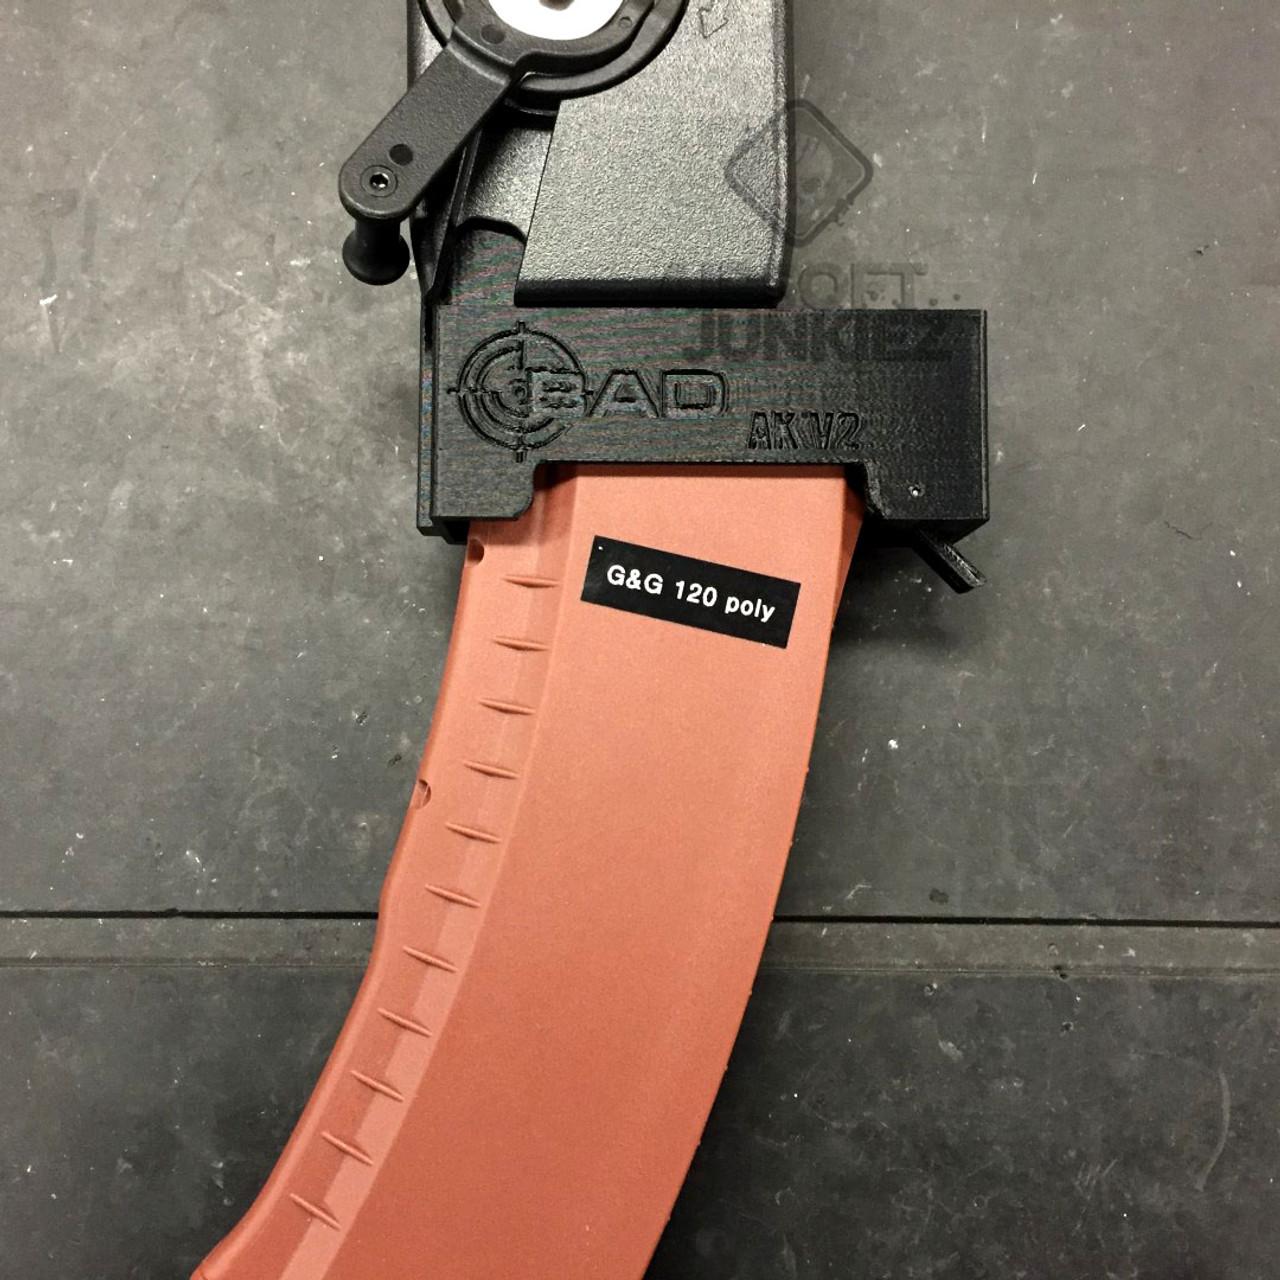 Bingo Airsoft Designs - Odin Innovations M12 Speed Loader Adapter for AK V4